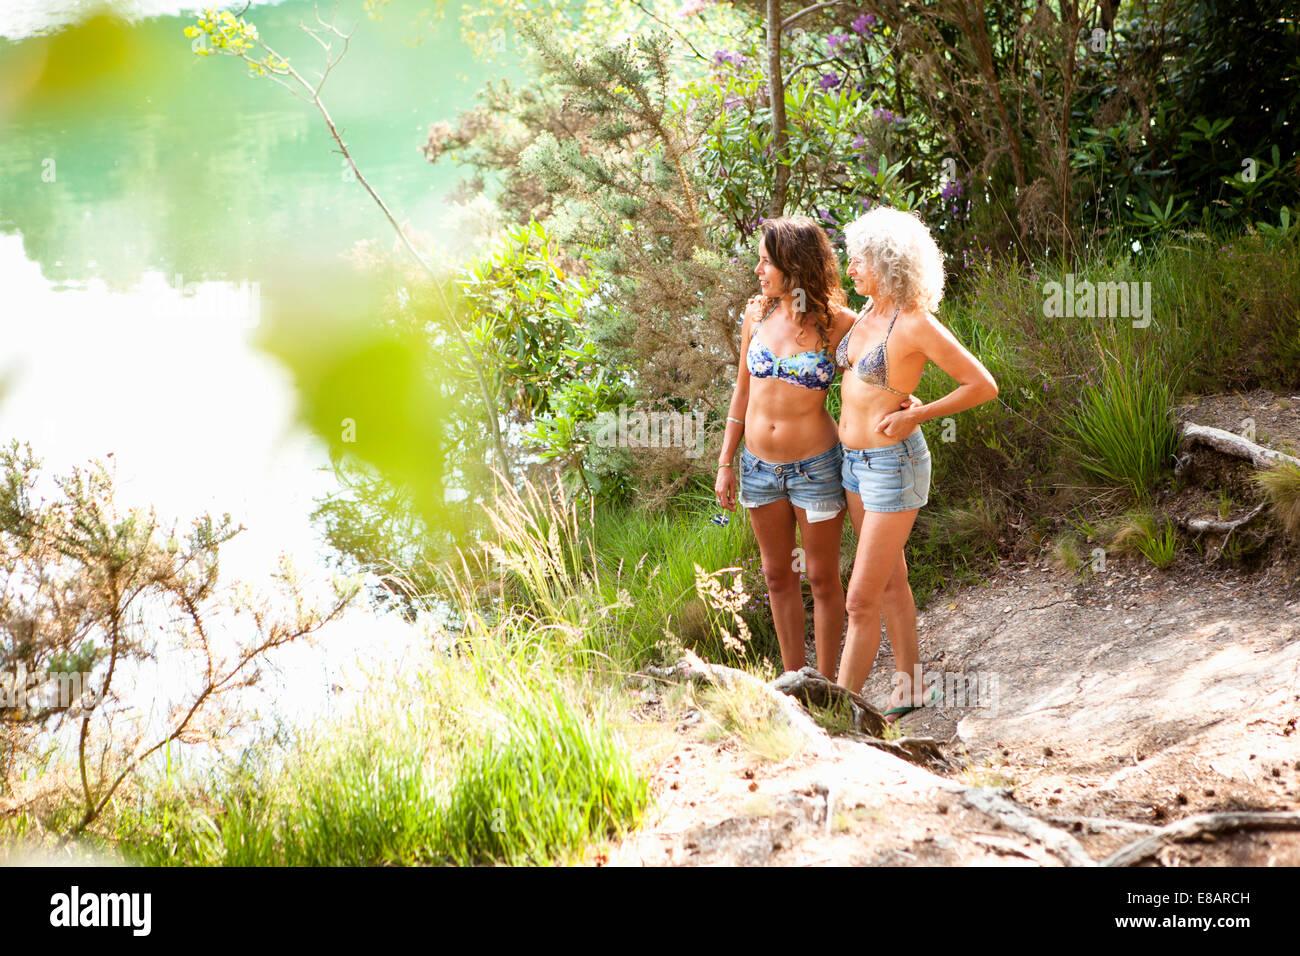 Madre e hija disfrutando de la naturaleza, la piscina azul Wareham, Dorset, Reino Unido Foto de stock